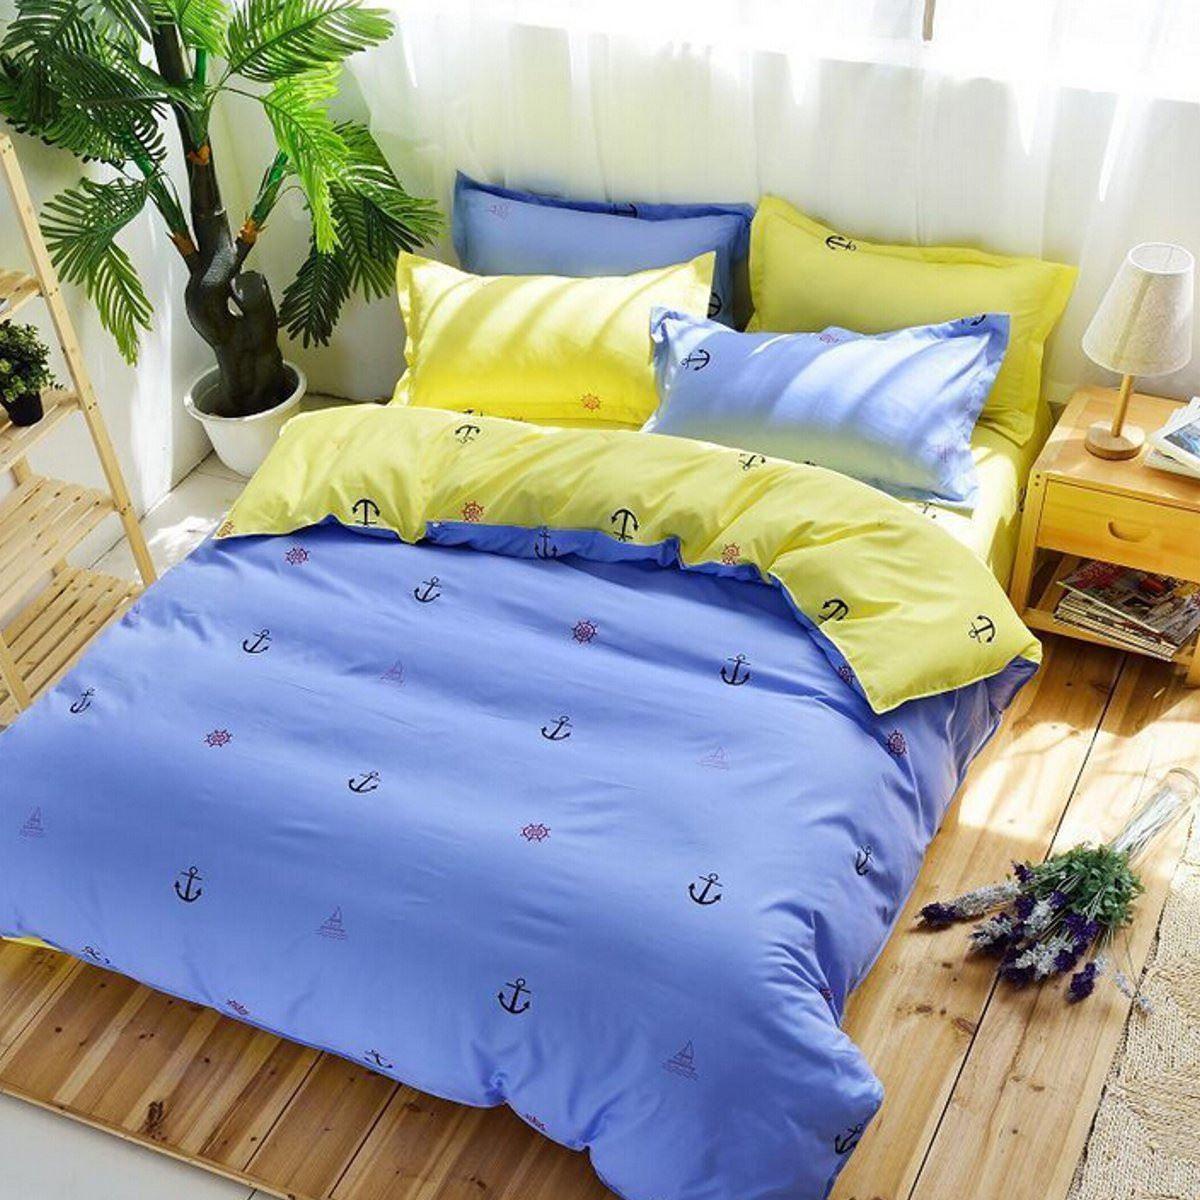 Home textile seafaring journal printed bedding sets cotton - King size bed sheet set ...